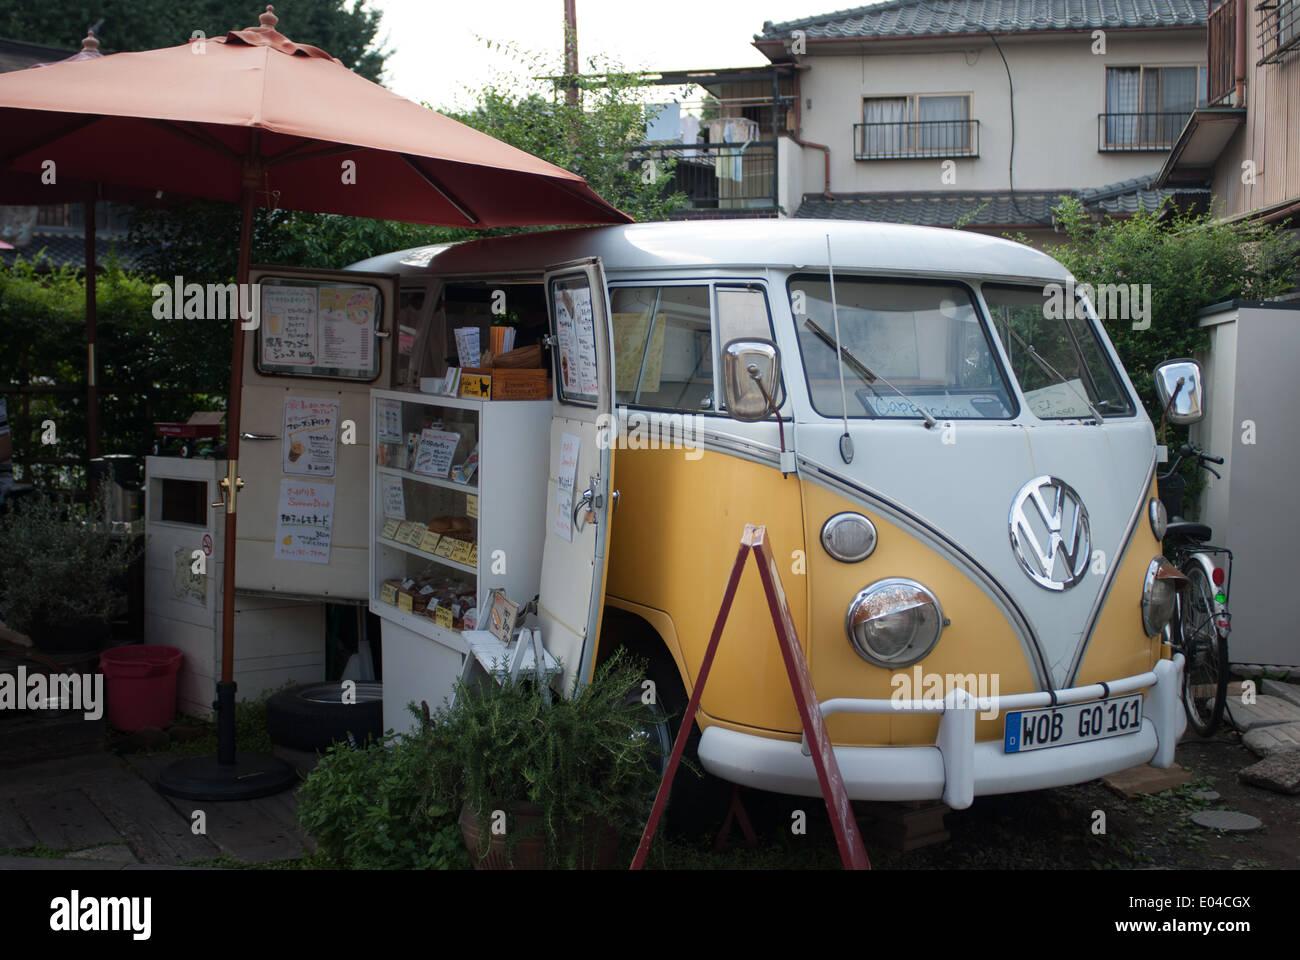 Shop in Kamakura, Kanagawa Prefecture, Japan - Stock Image